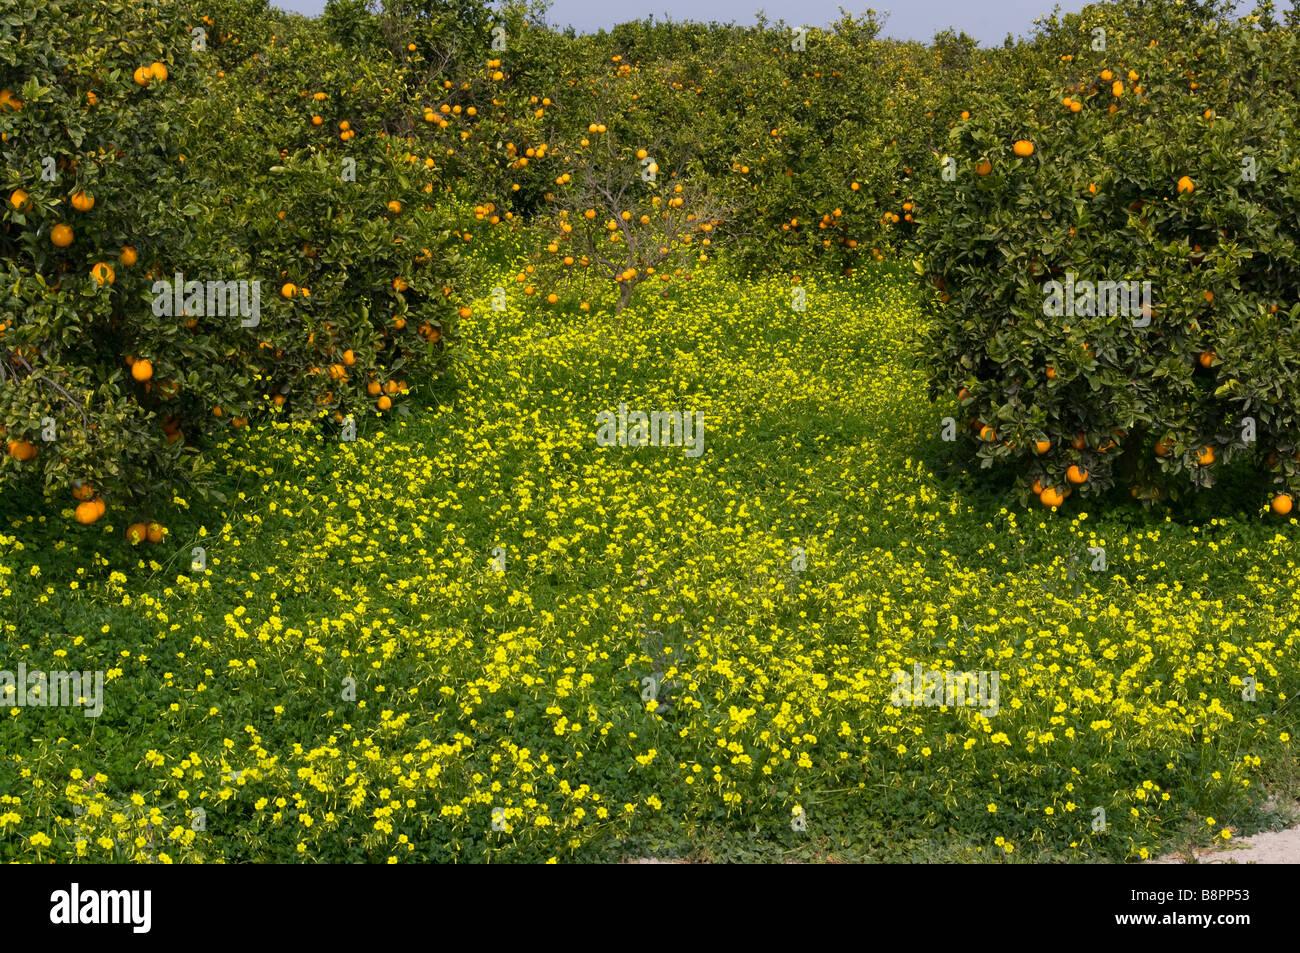 Espanol Naranjas Naranjos Citricos En Campos De Flores Silvestres